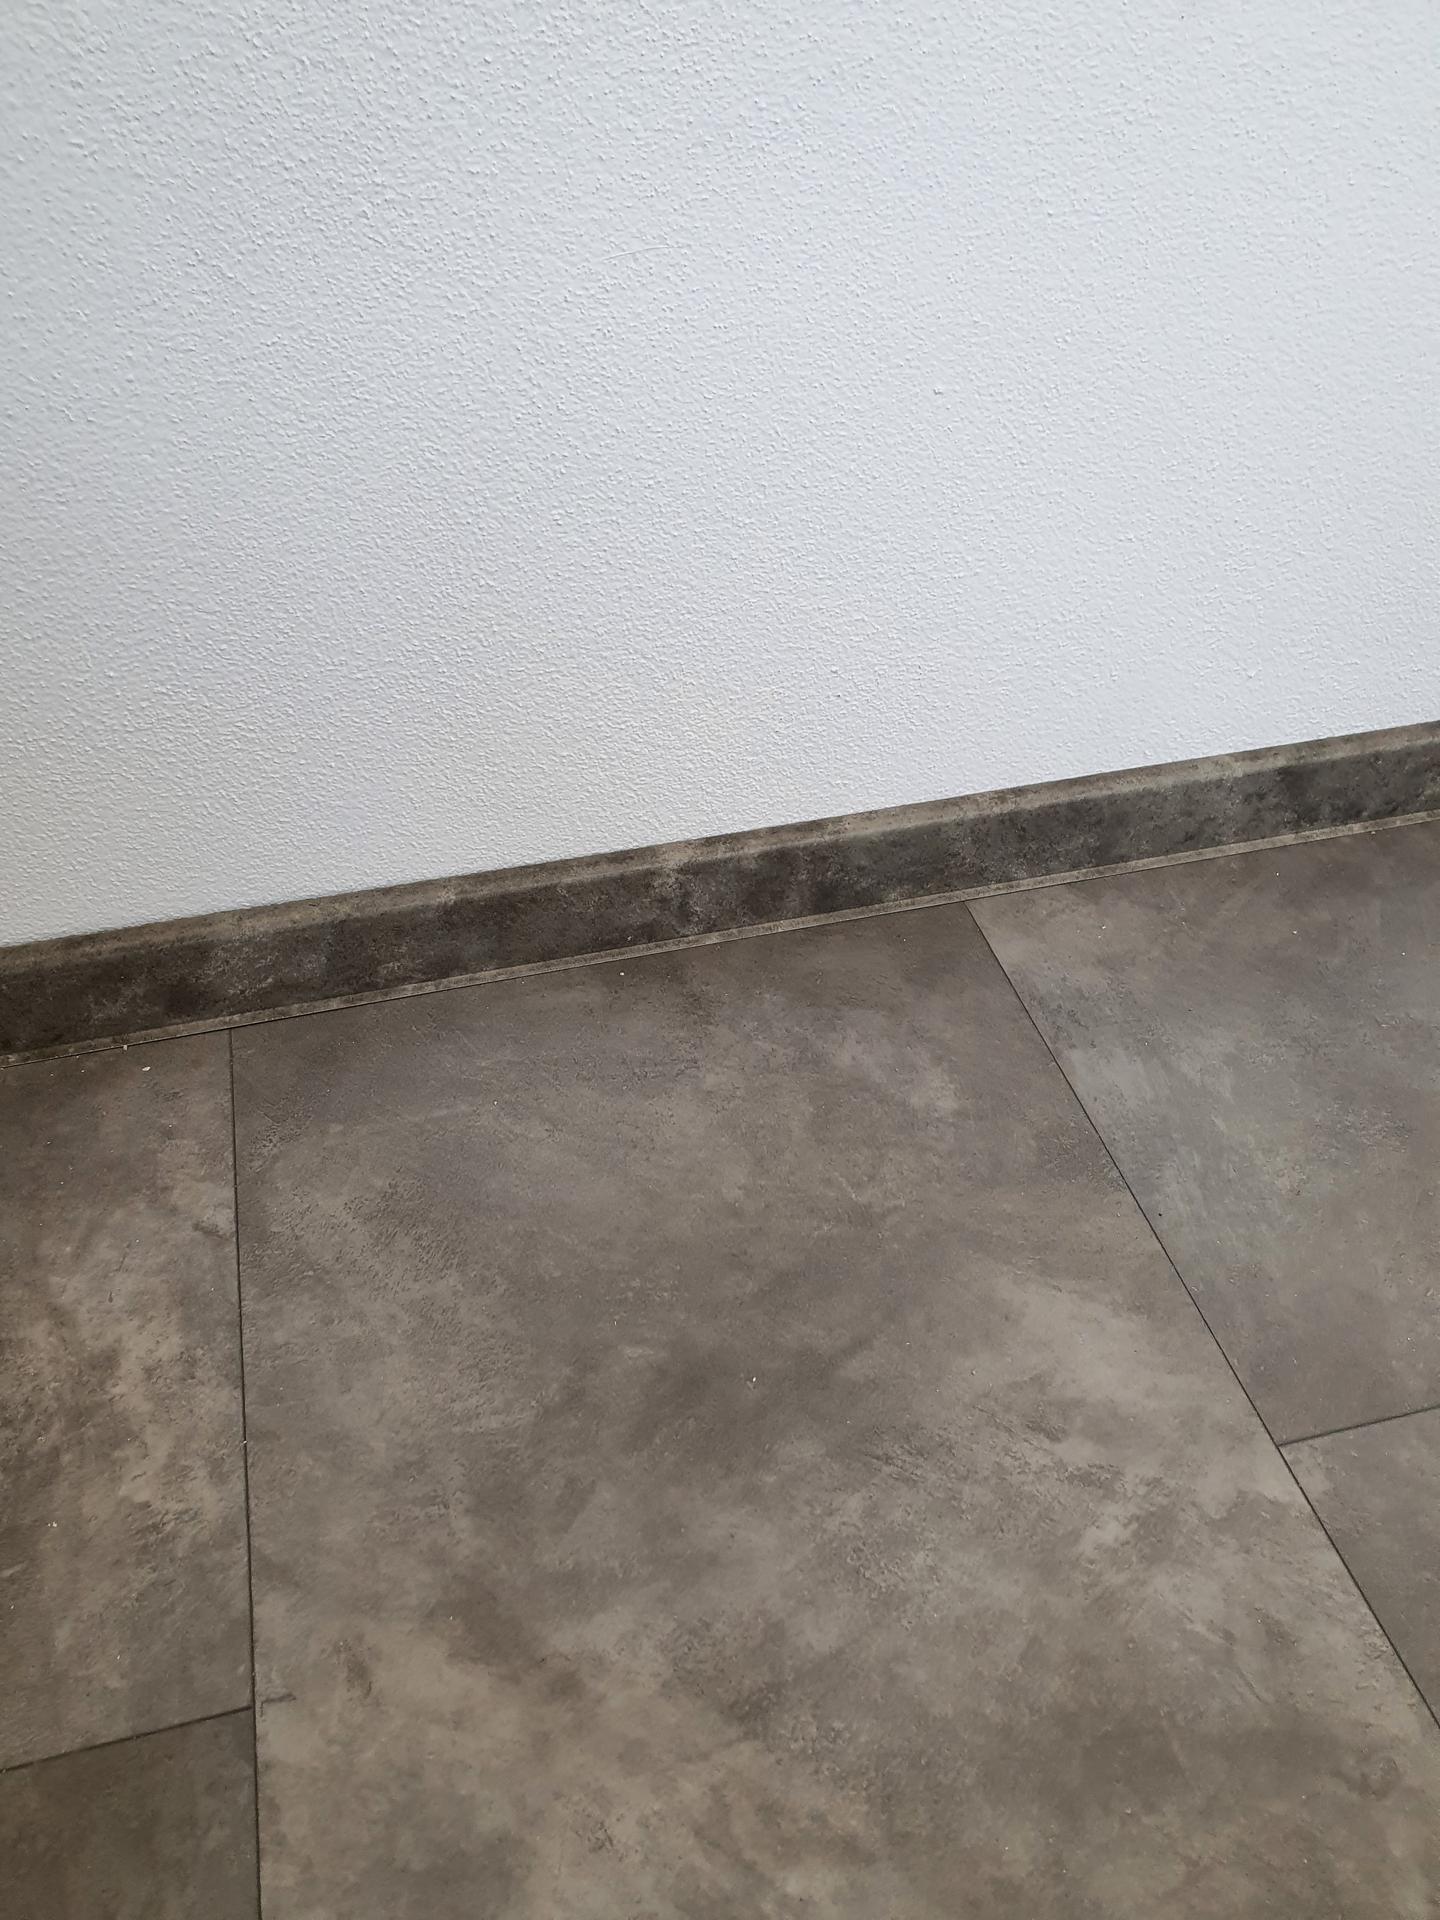 Pomaly finisujeme - Podlaha kompozitná Parador modular one beton tmavošedý. Lišta z Woodcotu znacka Gerflor